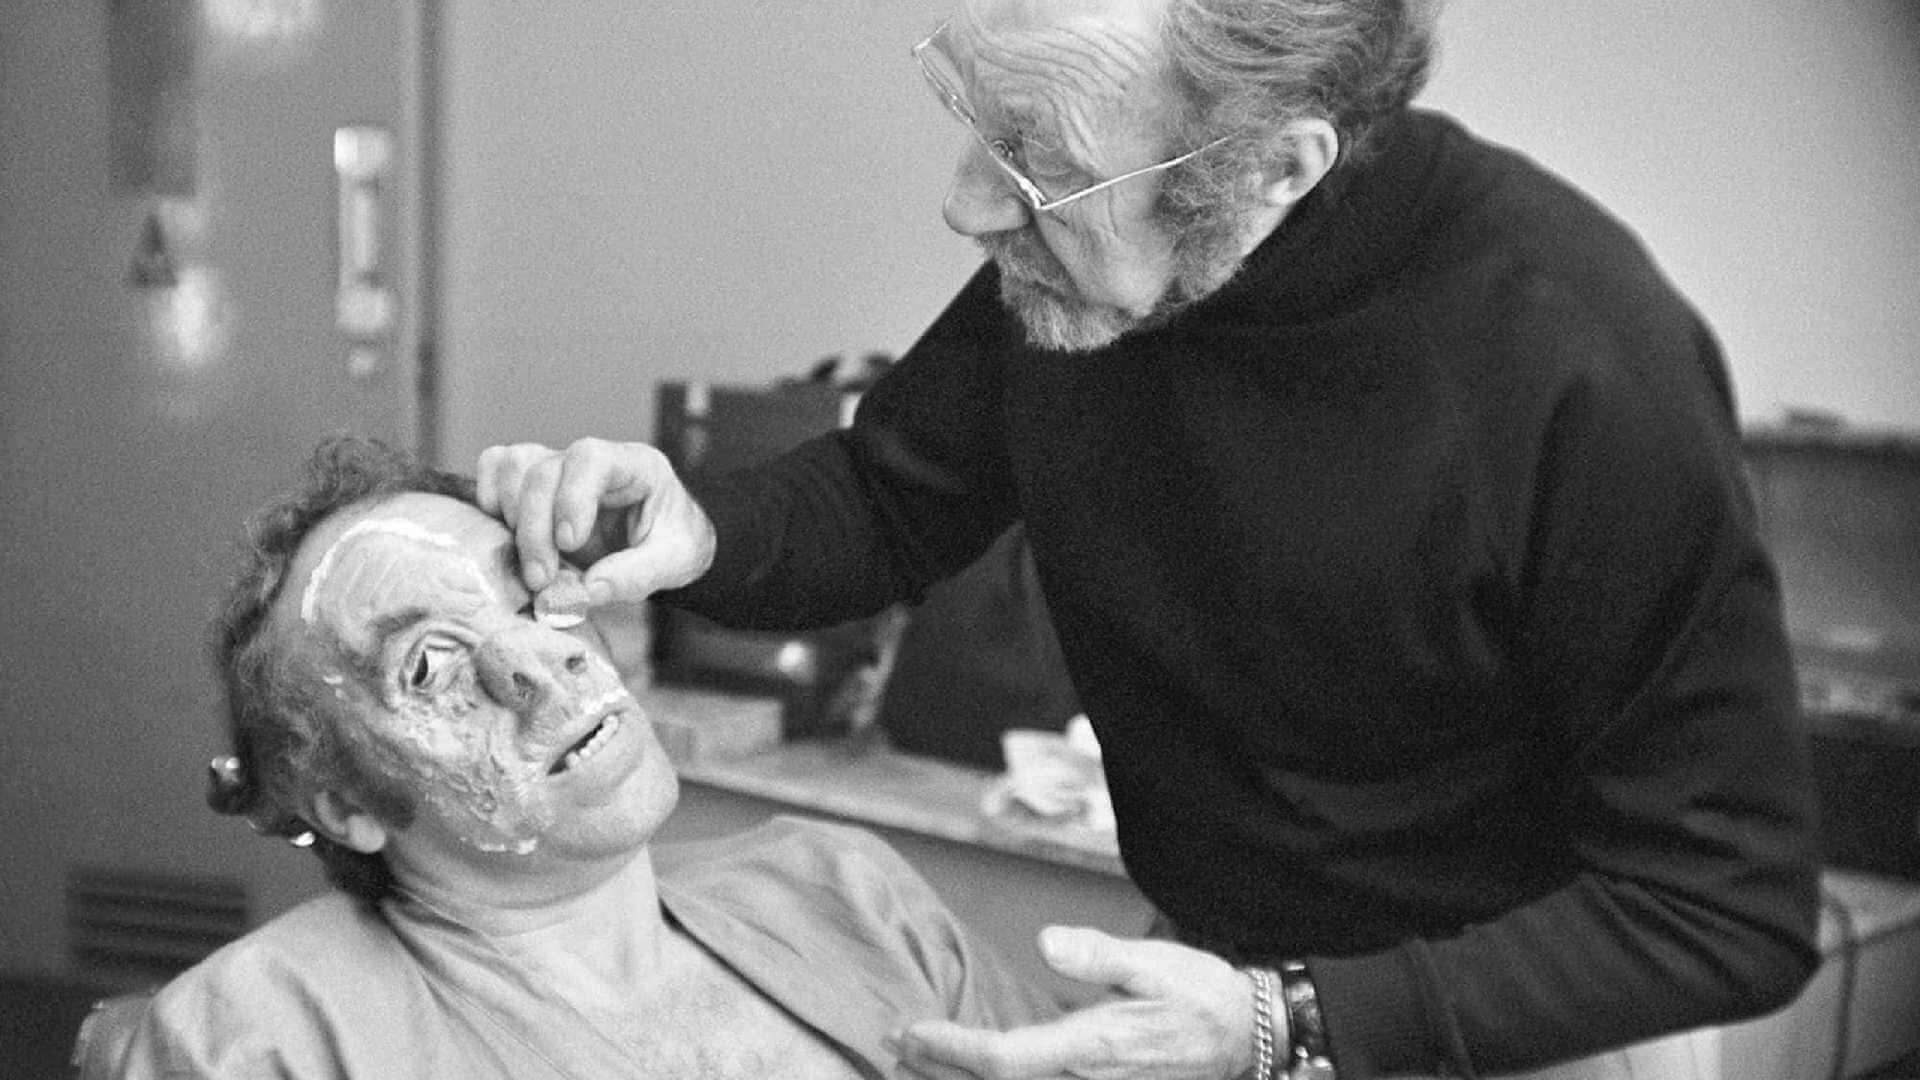 Star Wars Actor Alfie Curtis Is Dead At 87